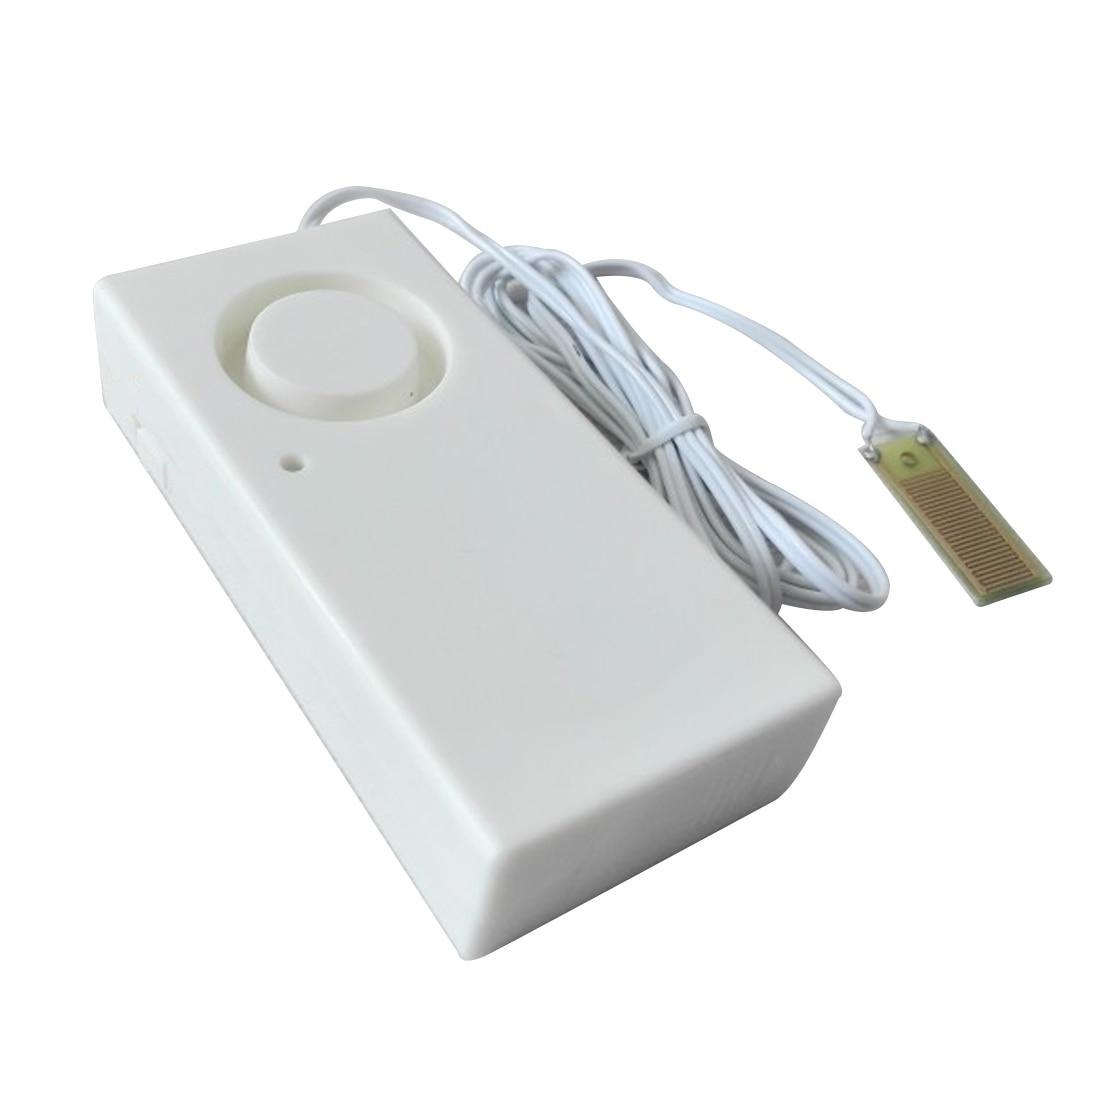 Begeistert 1 Stück Wasser Leck Alarm Flut Ebene Überlauf Detektor Sensor Alarm Home Security Alarm Leckage Alarm Detektor